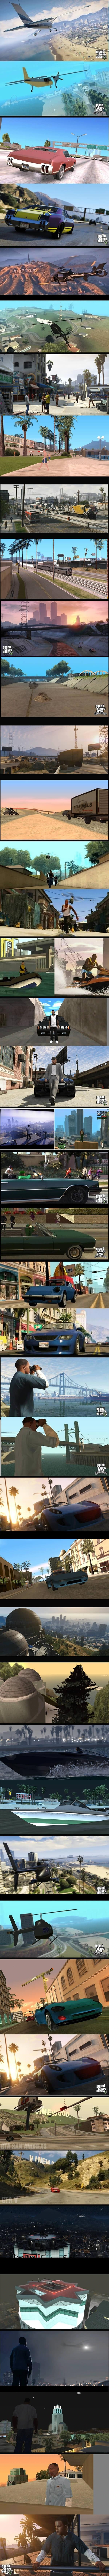 GTA San Andreas vs GTA V